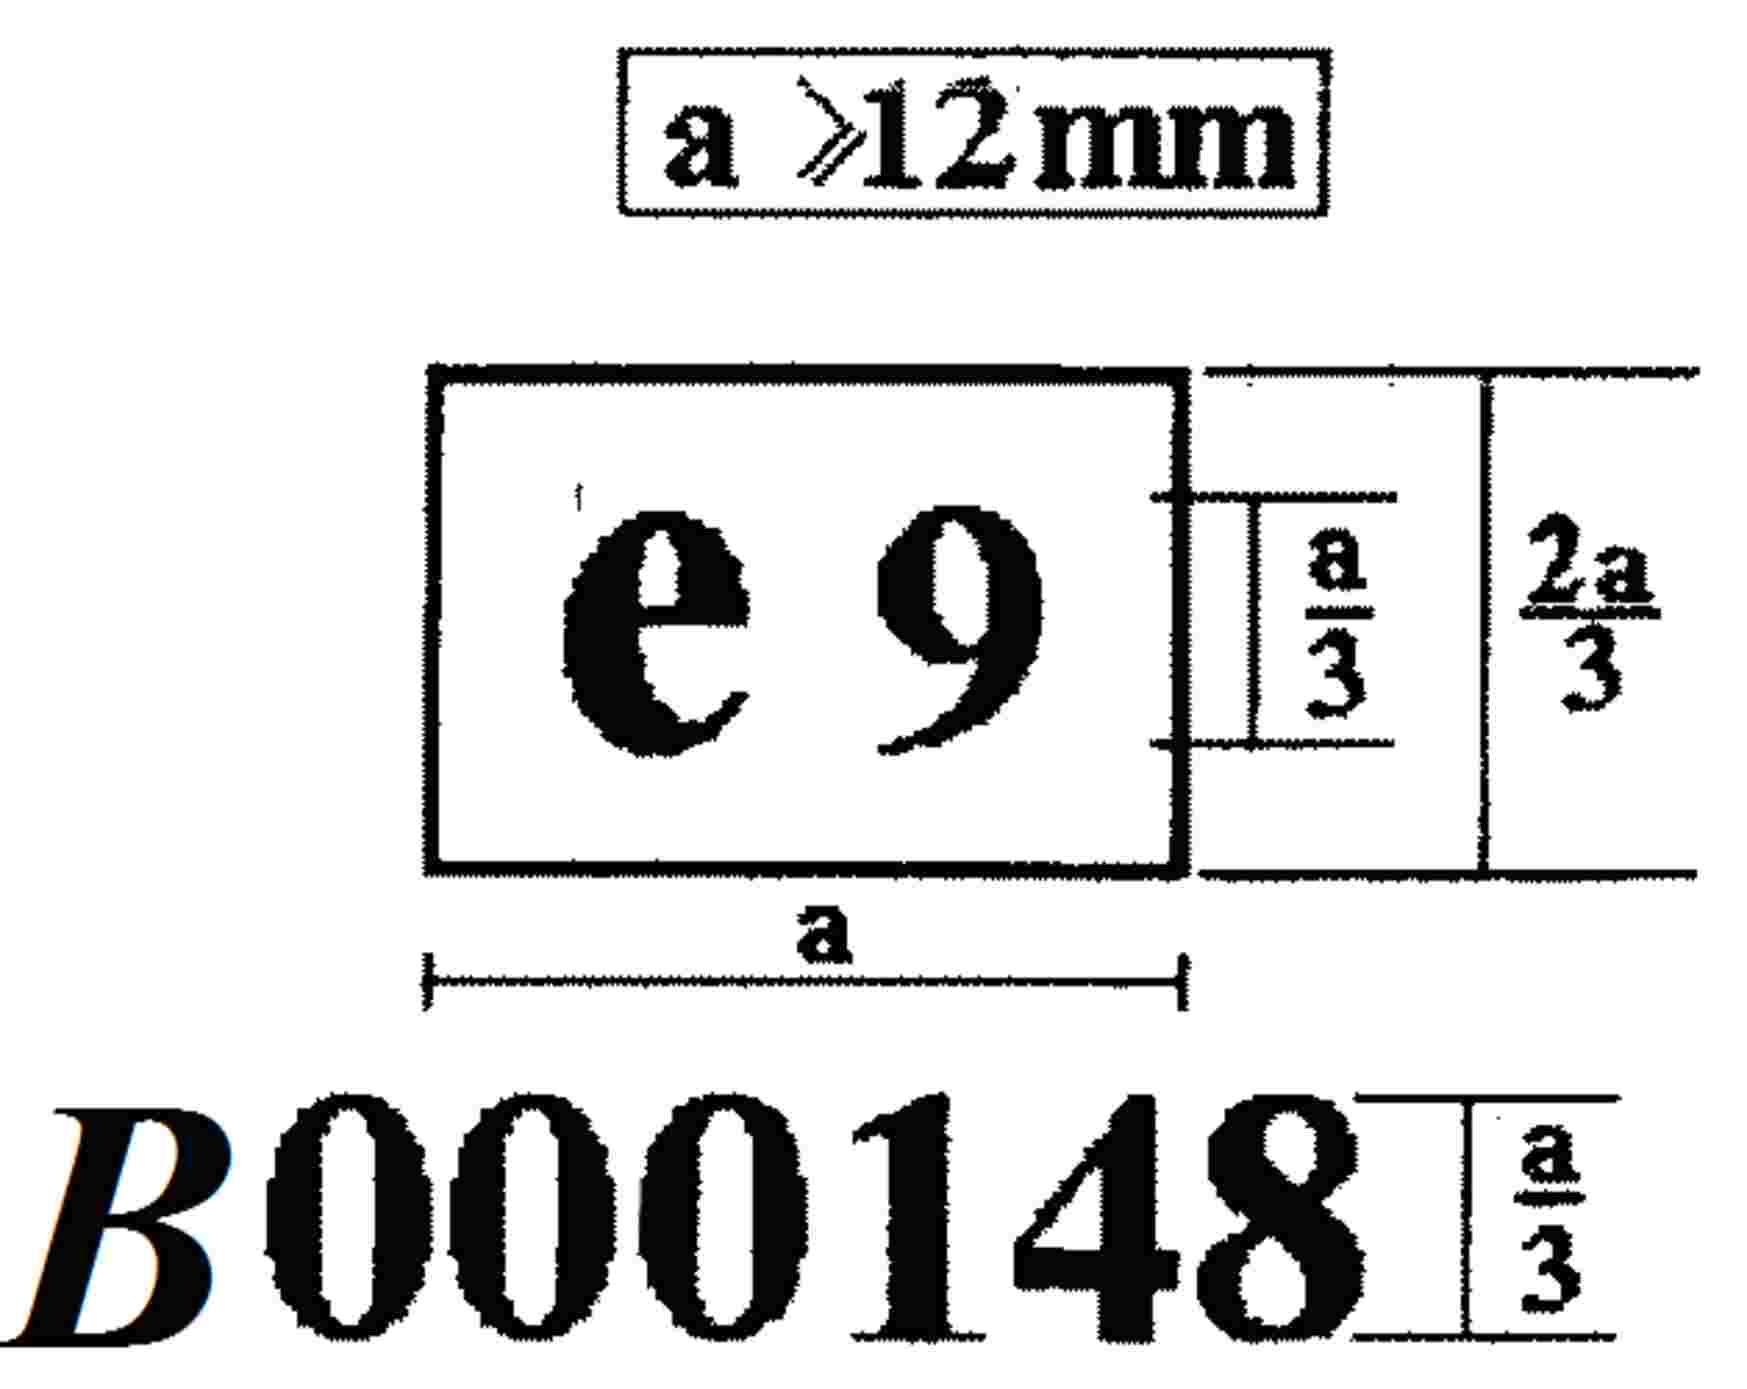 EUR-Lex - 32014R0540 - EN - EUR-Lex